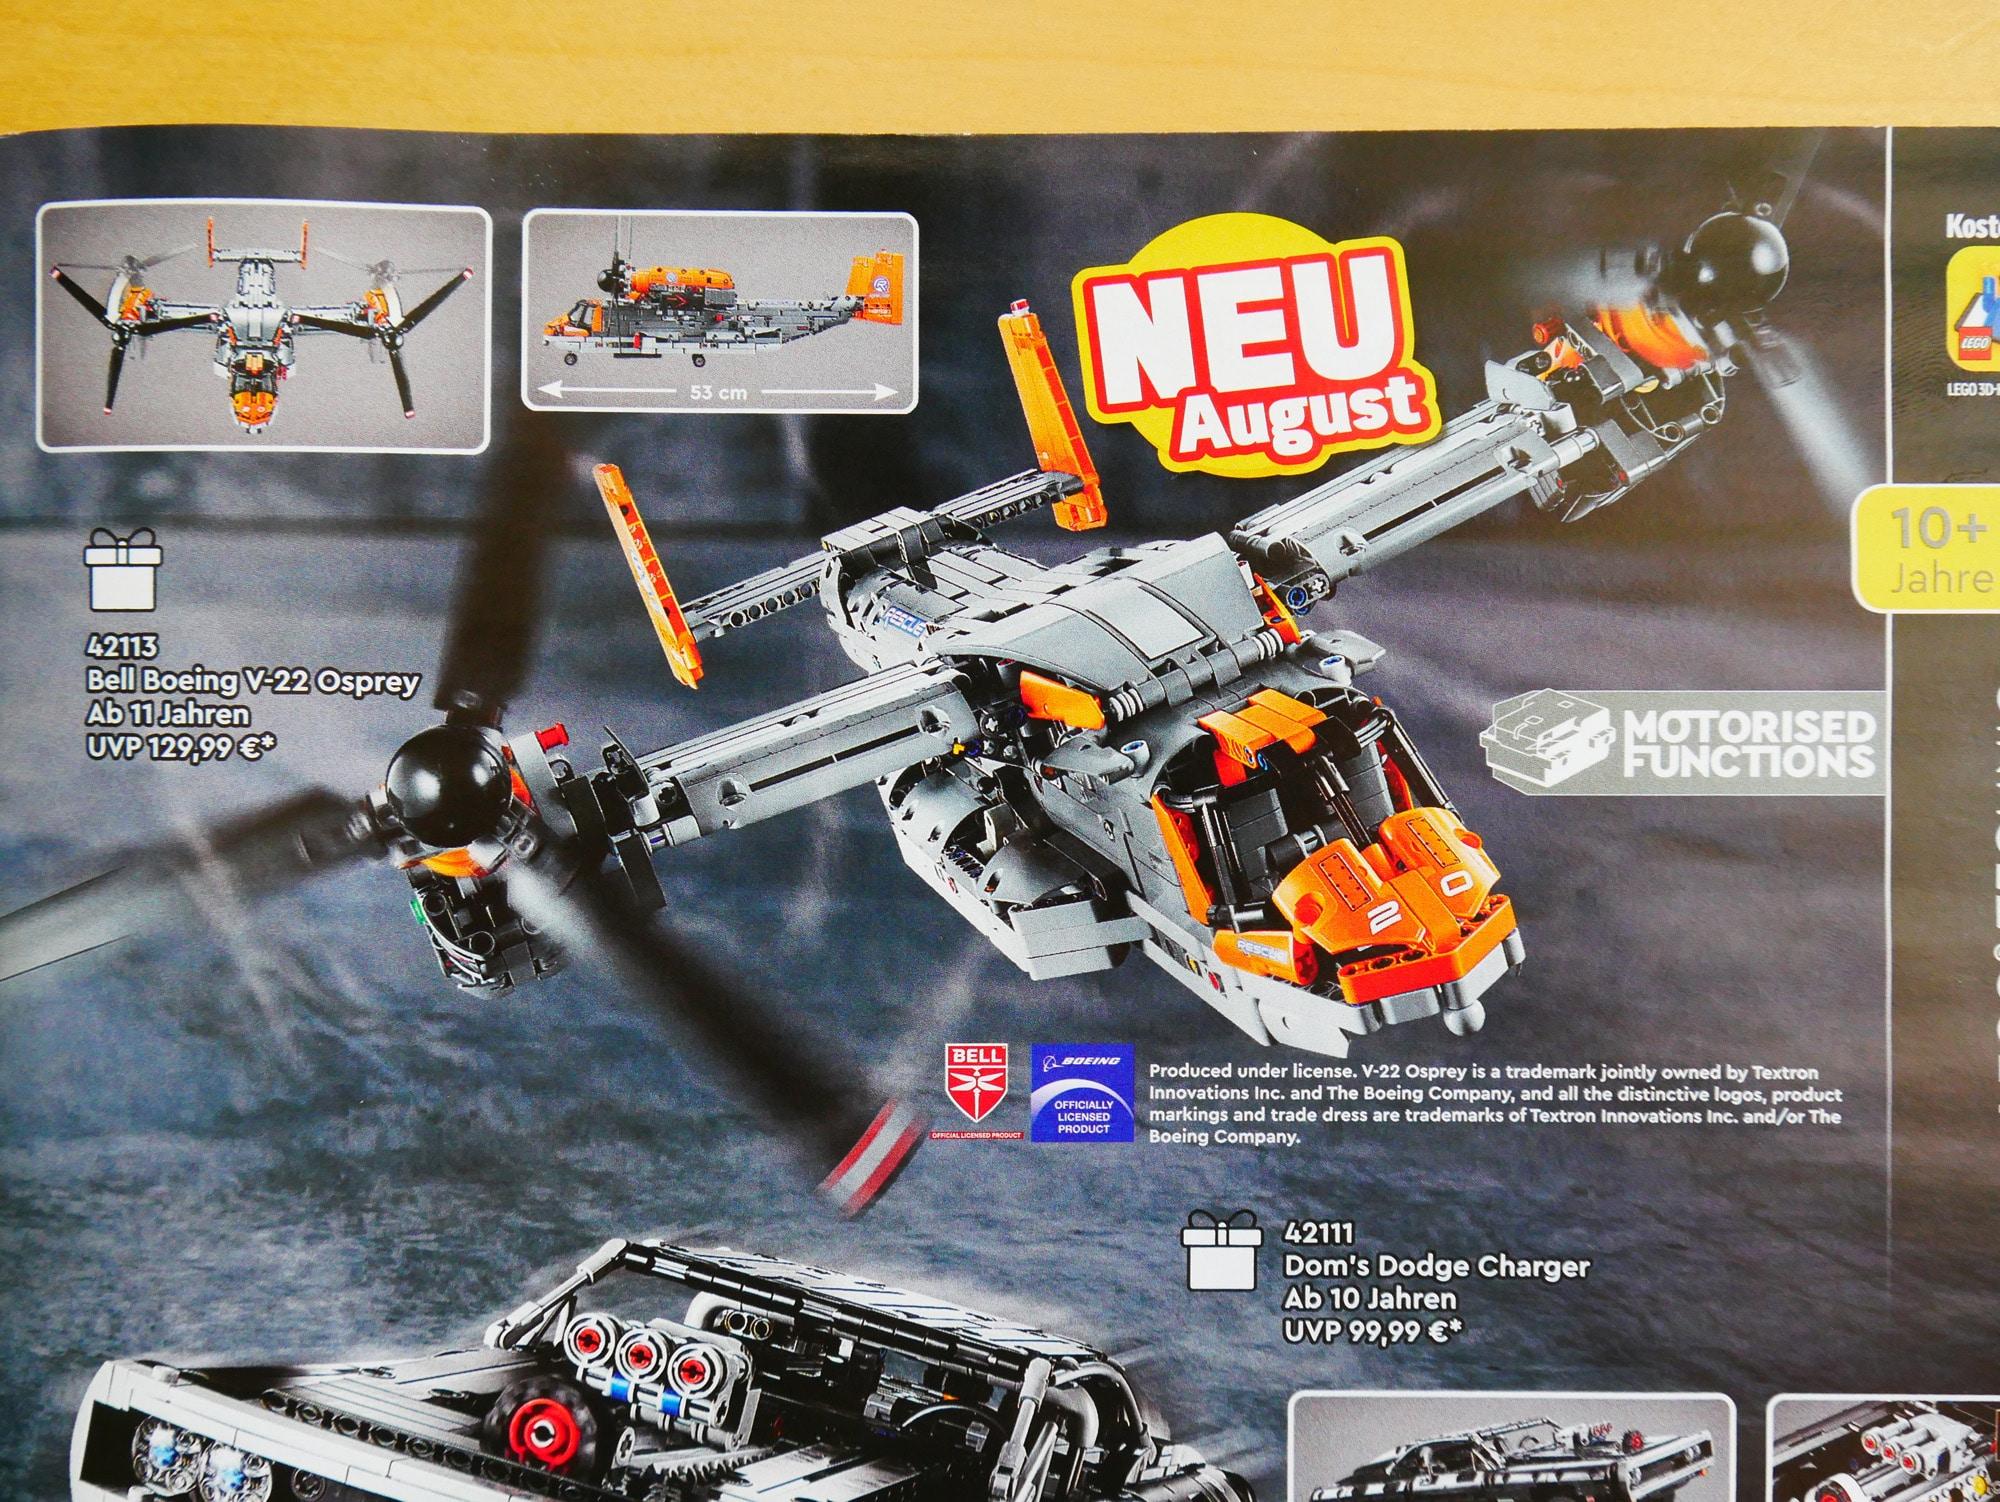 LEGO Technic August 2020 (1)